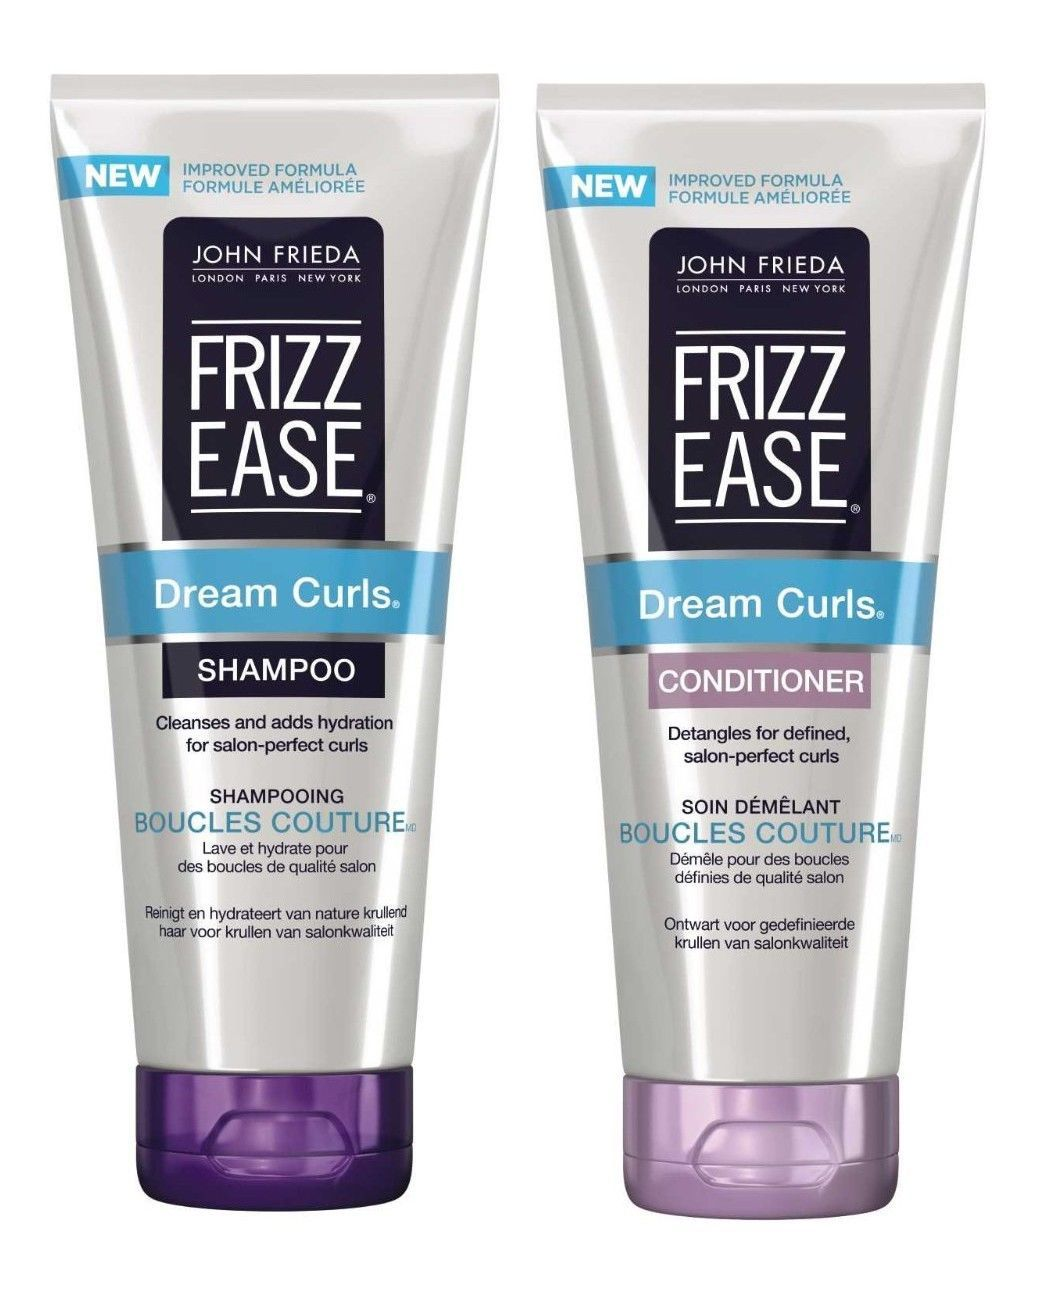 John Frieda Frizz Ease Dream Curls Shampoo Conditioner 250ml Each ... 5cee867de2